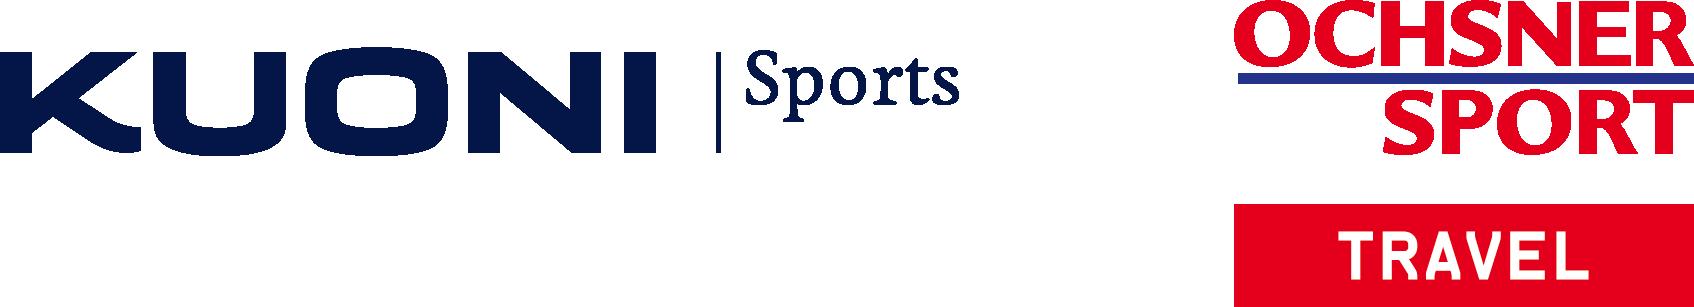 Kuoni Sports | Ochsner Sport Travel